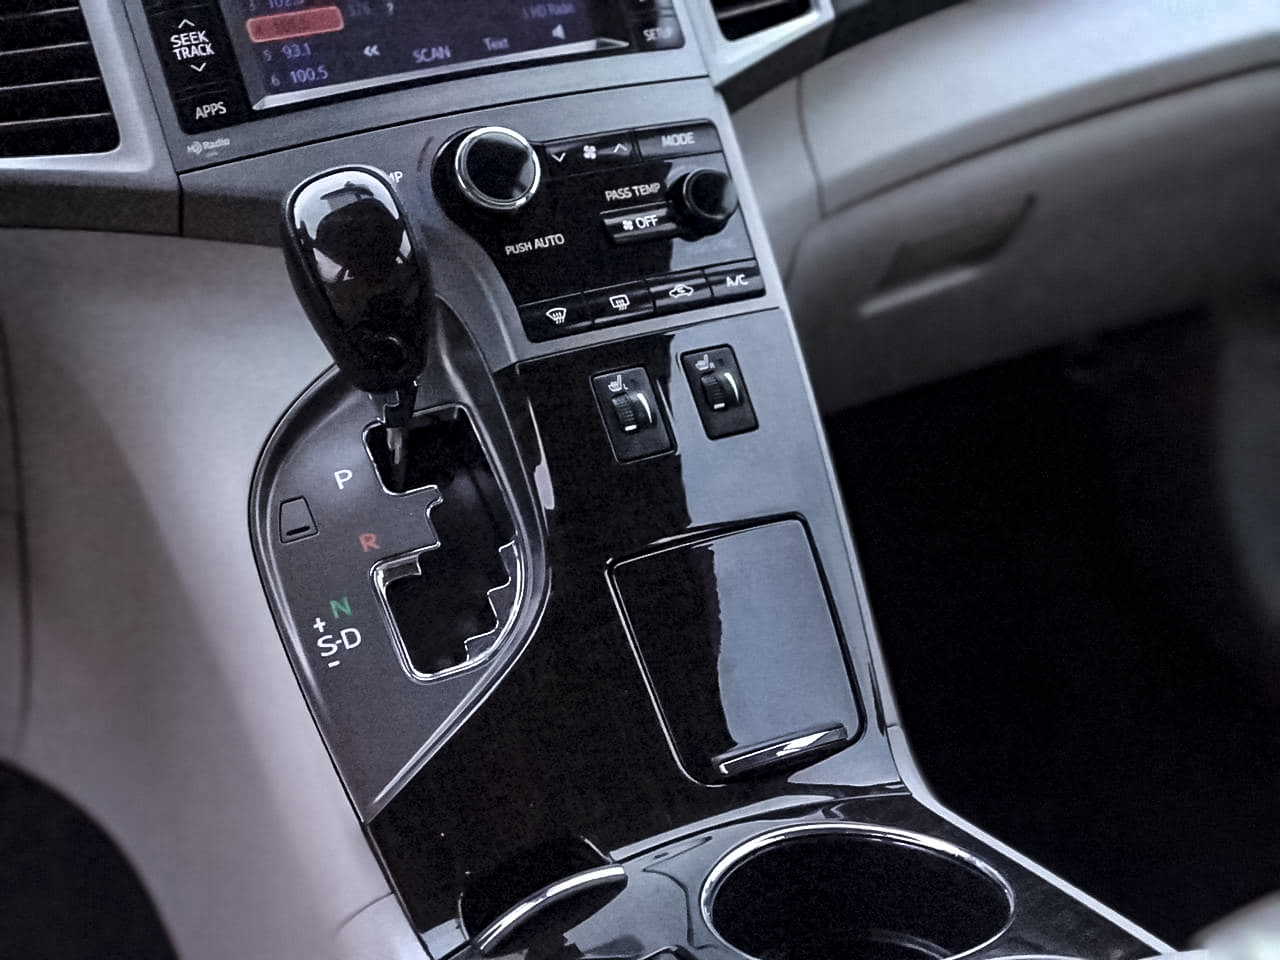 2014 Toyota VENZA | Vin: 4T3BA3BB3EU062212